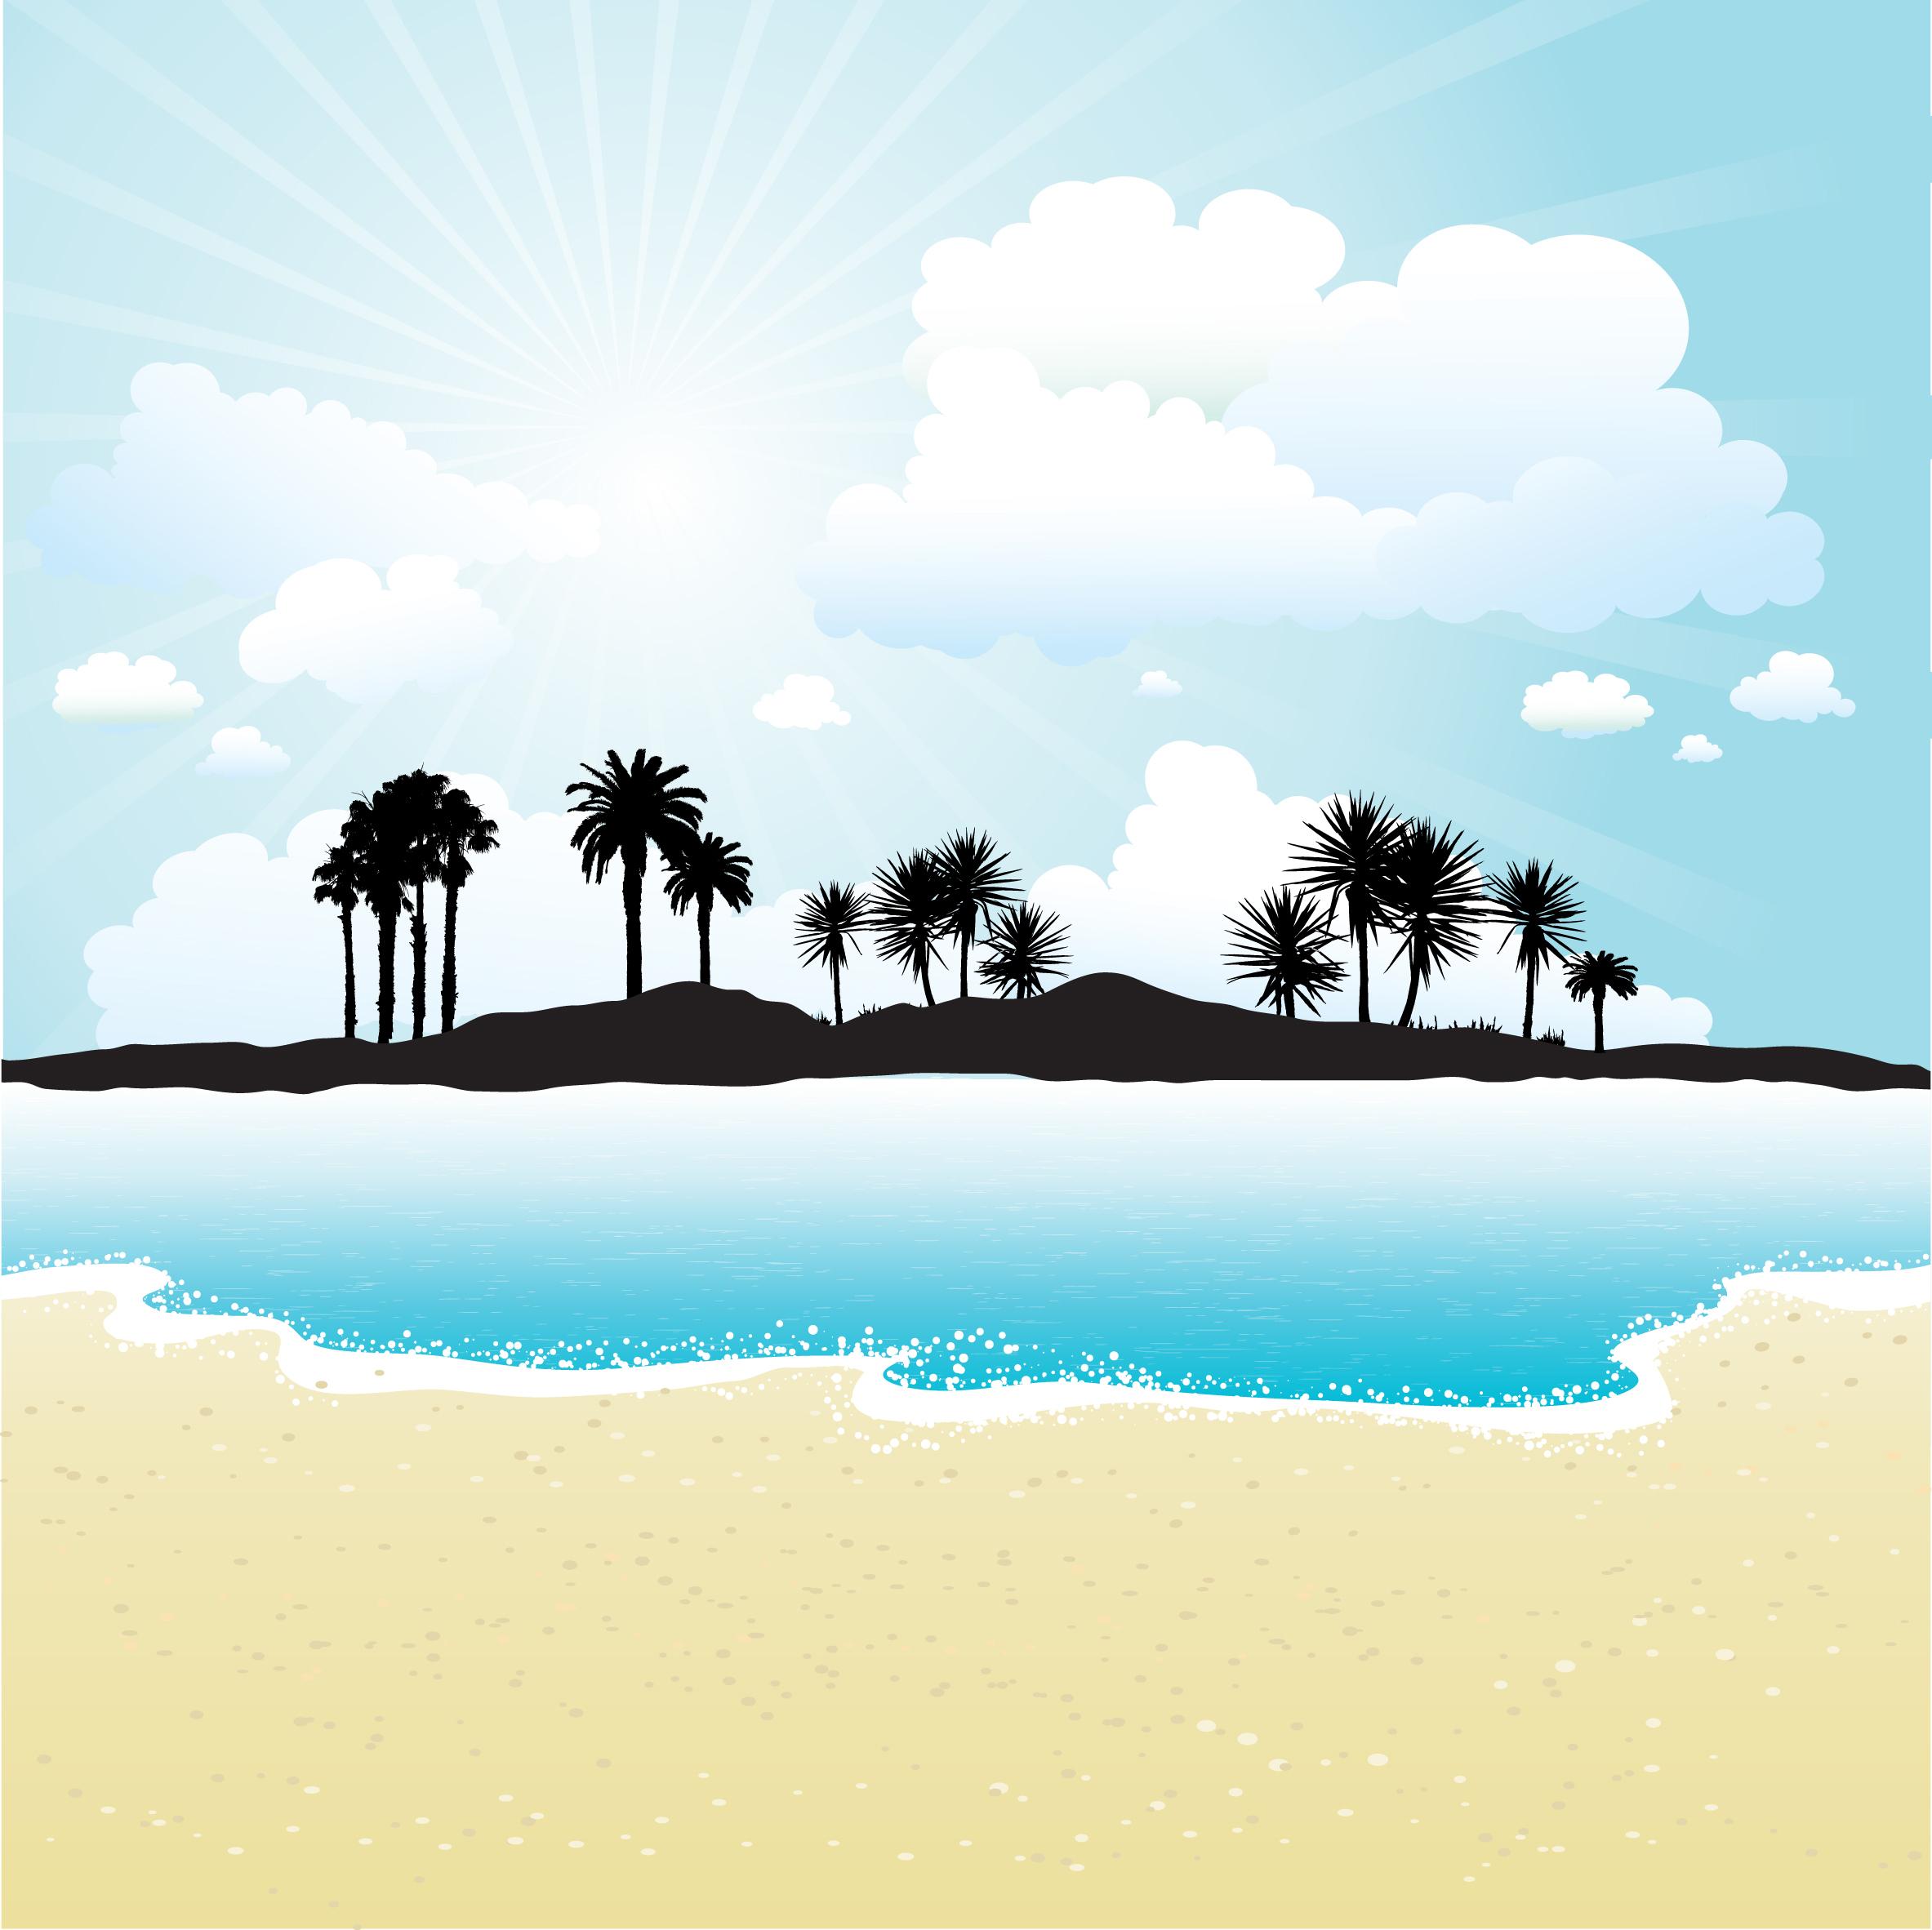 Tropical Island Paradise: Tropical Island Free Vector Art